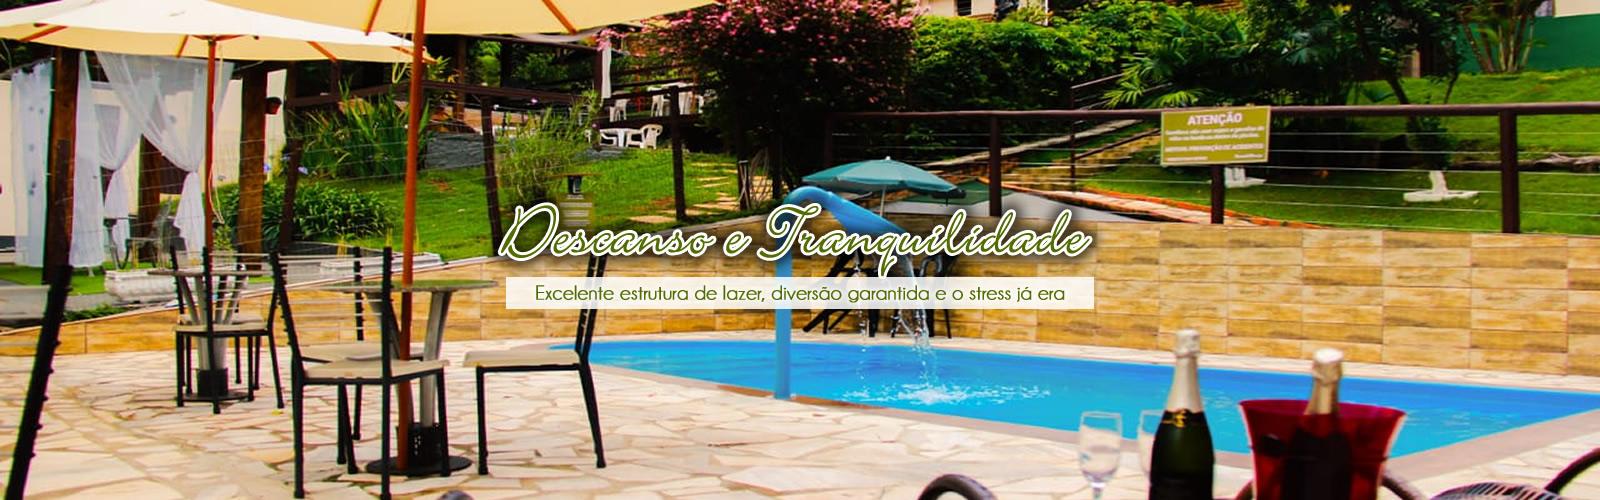 banner_piscina2